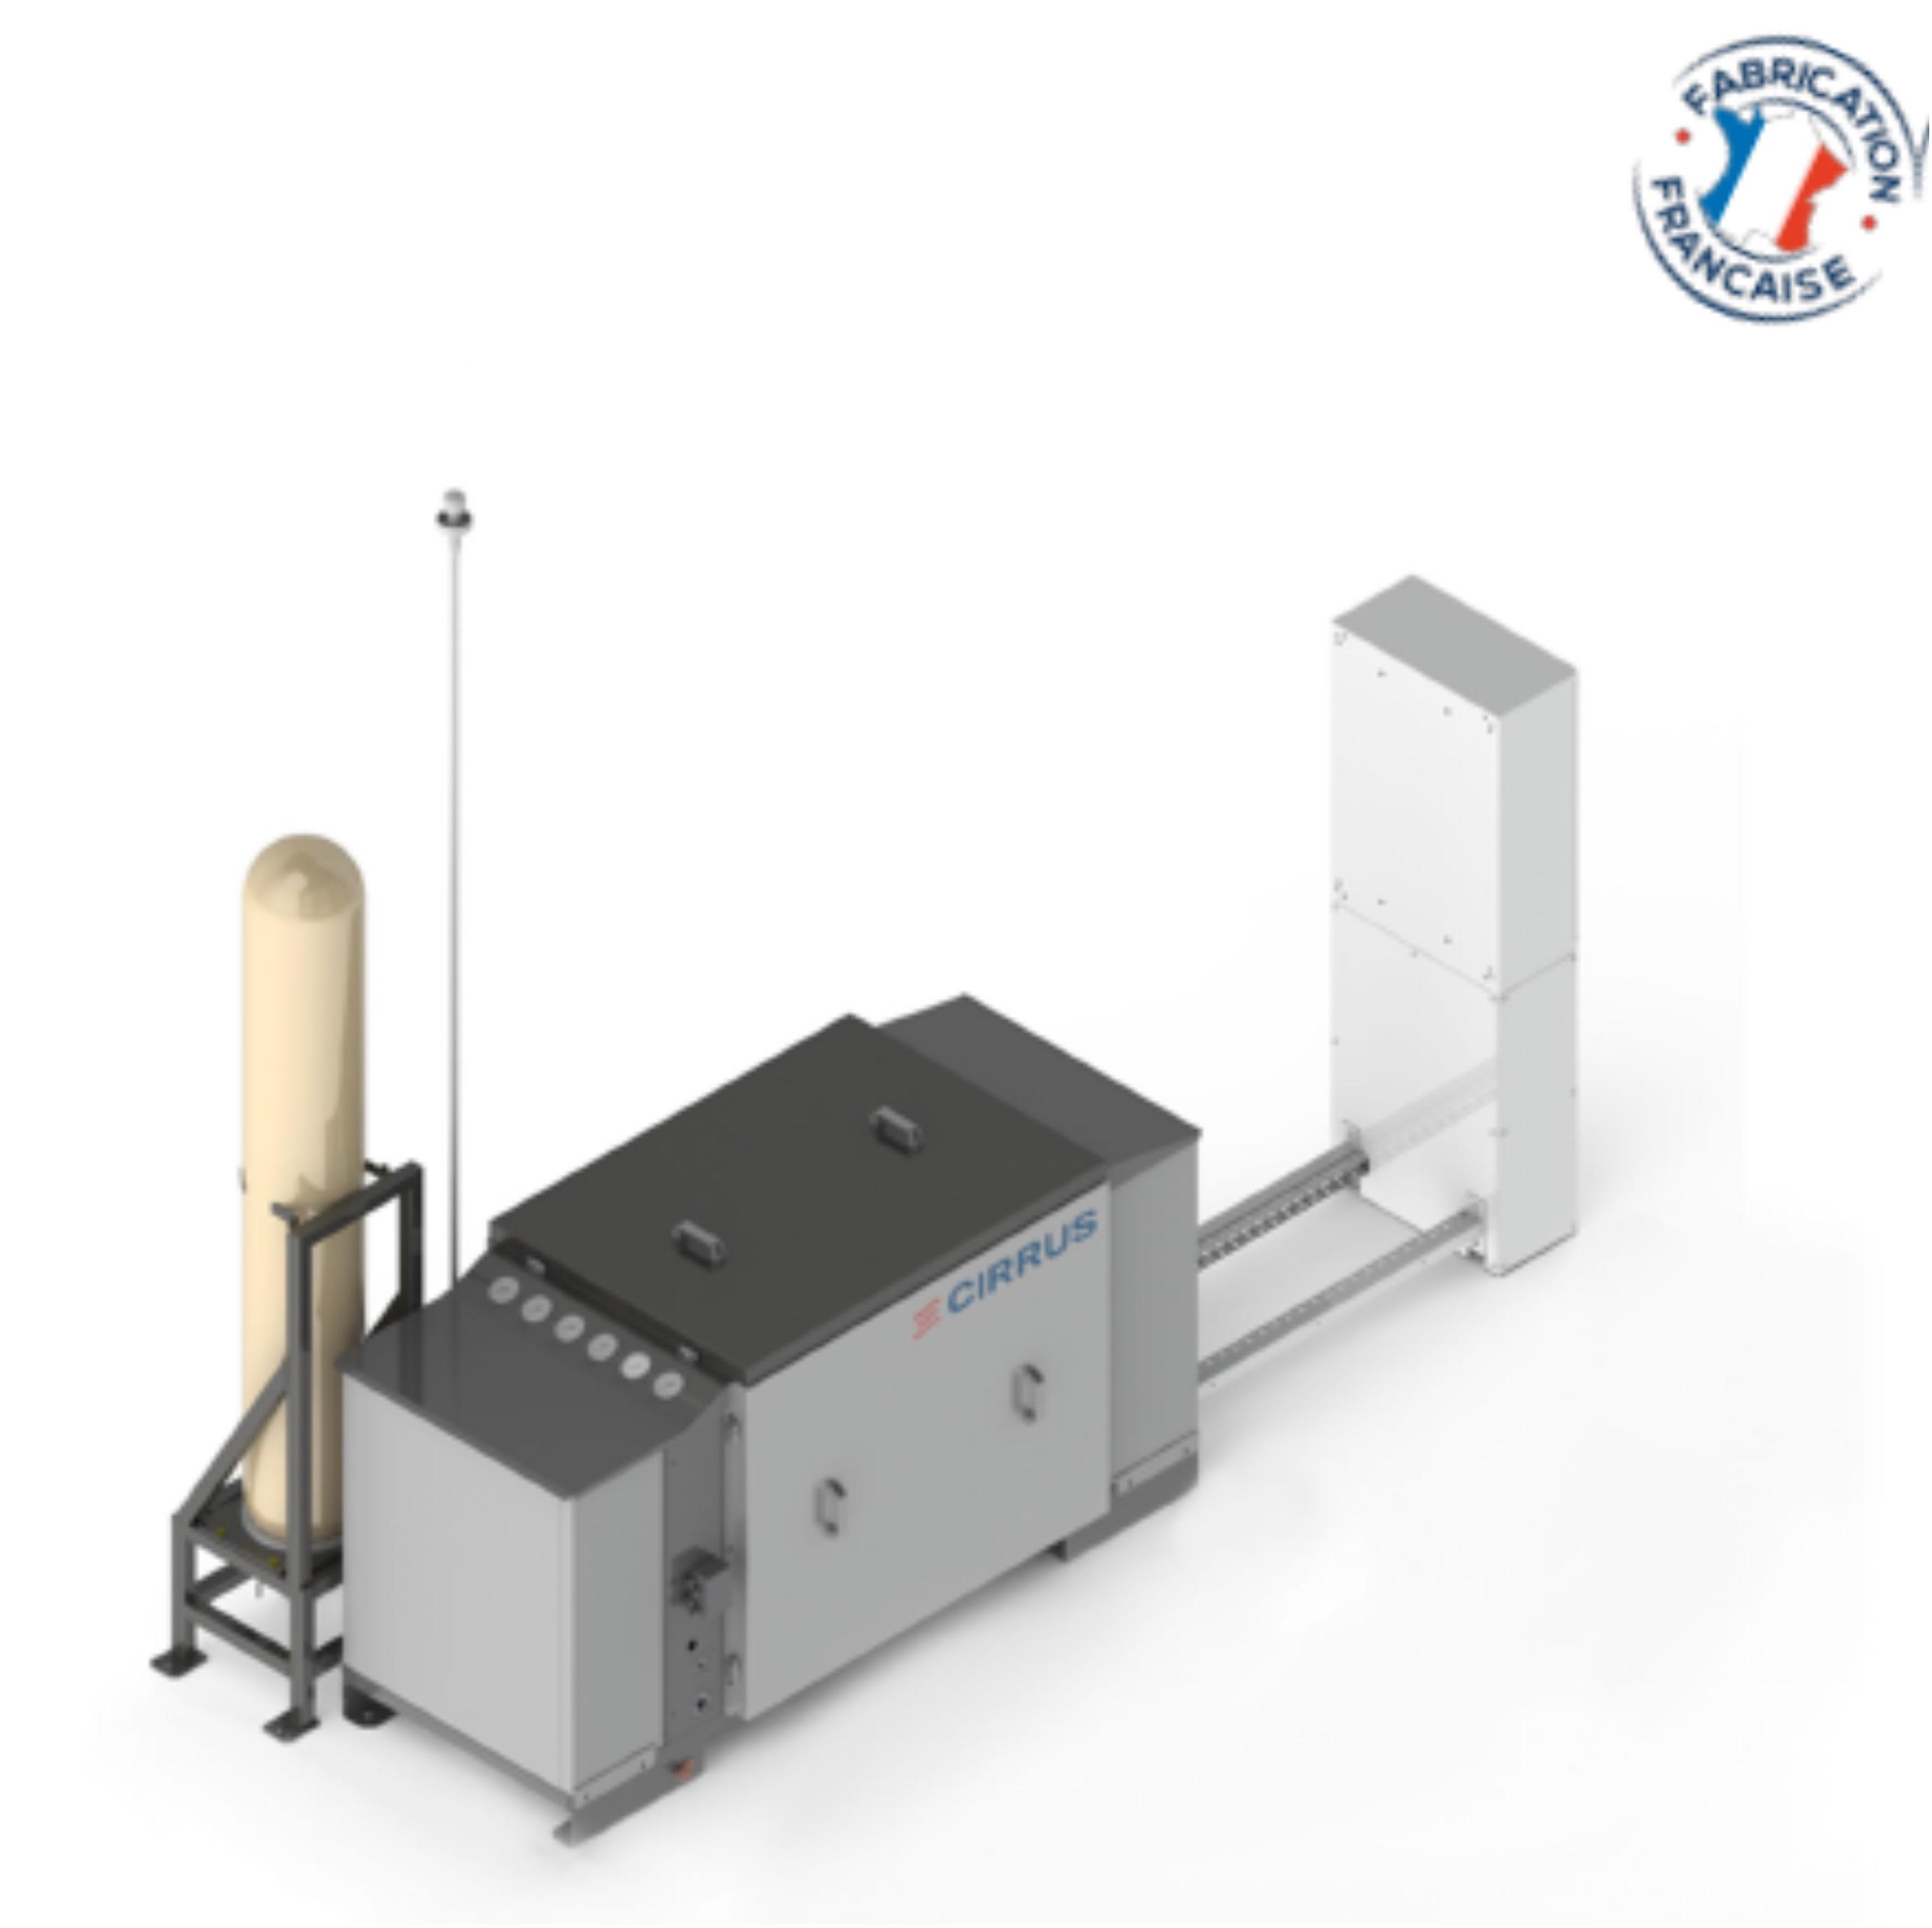 APC-Tech-H compresseur GNV H8 CIRRUS